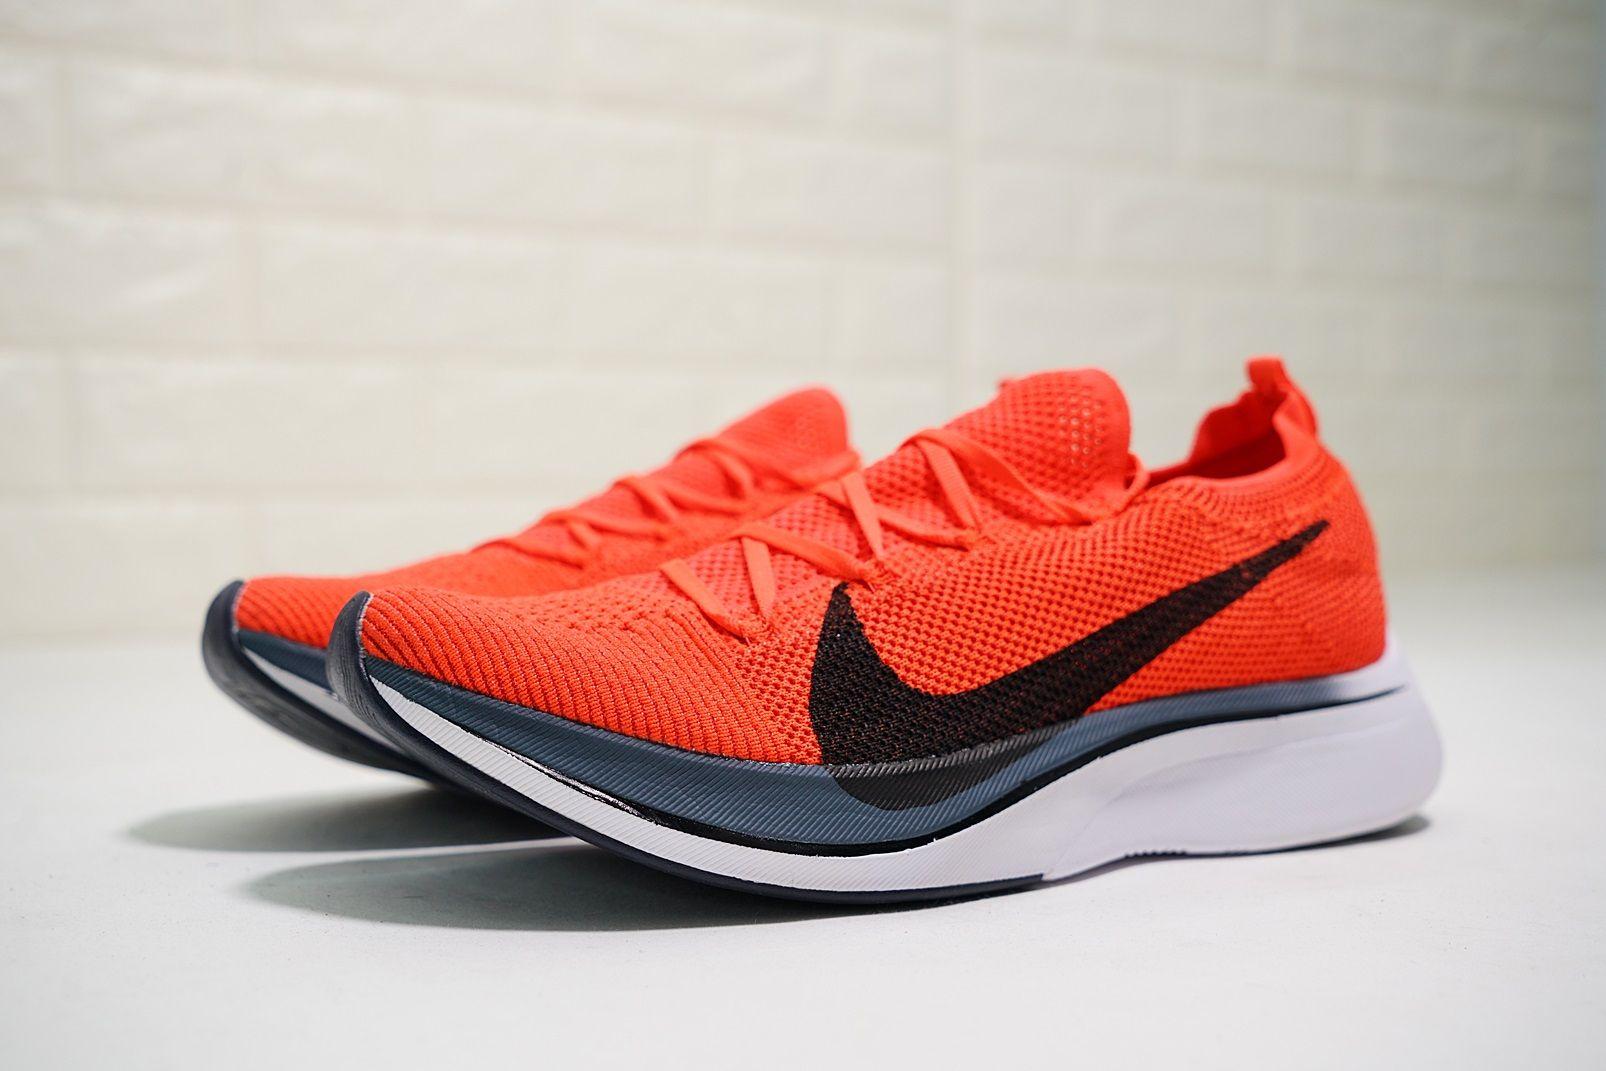 buy popular c5f7e 8b7f3 nike zoom vaporfly 4% flyknit 飛線針織大勾情侶款馬拉松超級跑鞋